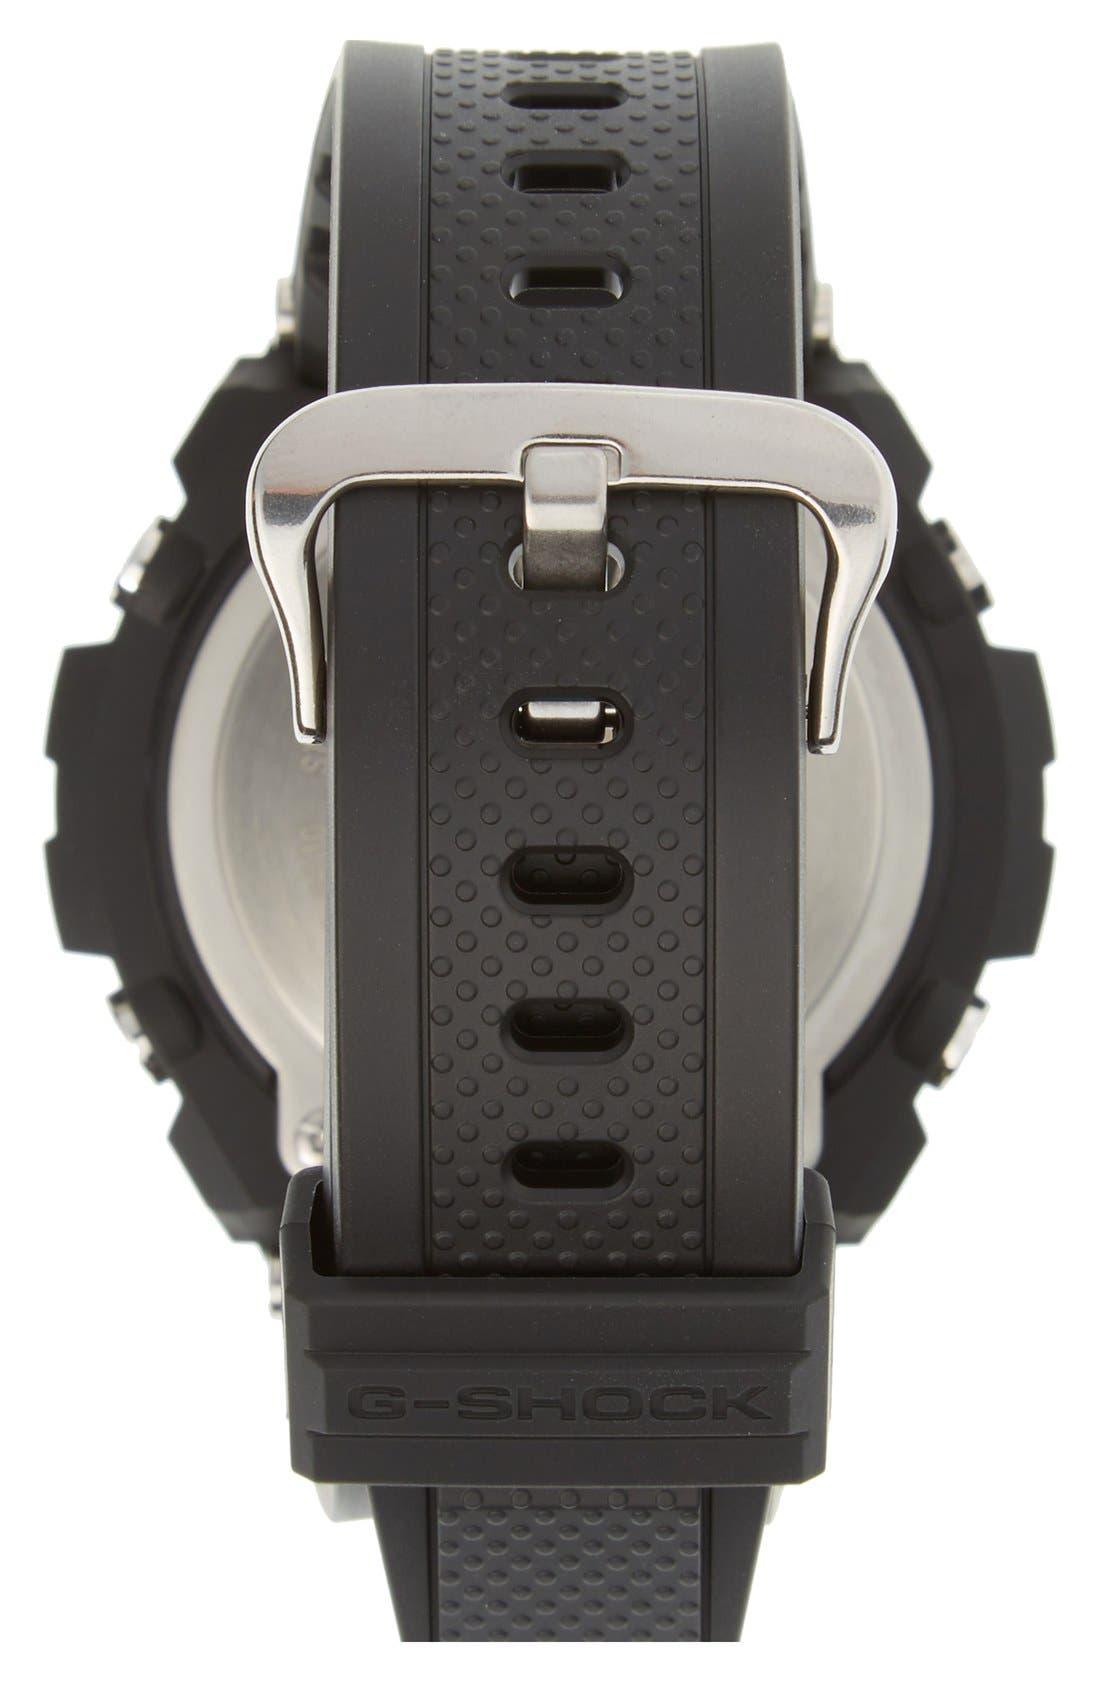 G-SHOCK BABY-G, G-Shock 'G-Steel' Ana-Digi Resin Strap Watch, 59mm x 52mm, Alternate thumbnail 4, color, BLACK